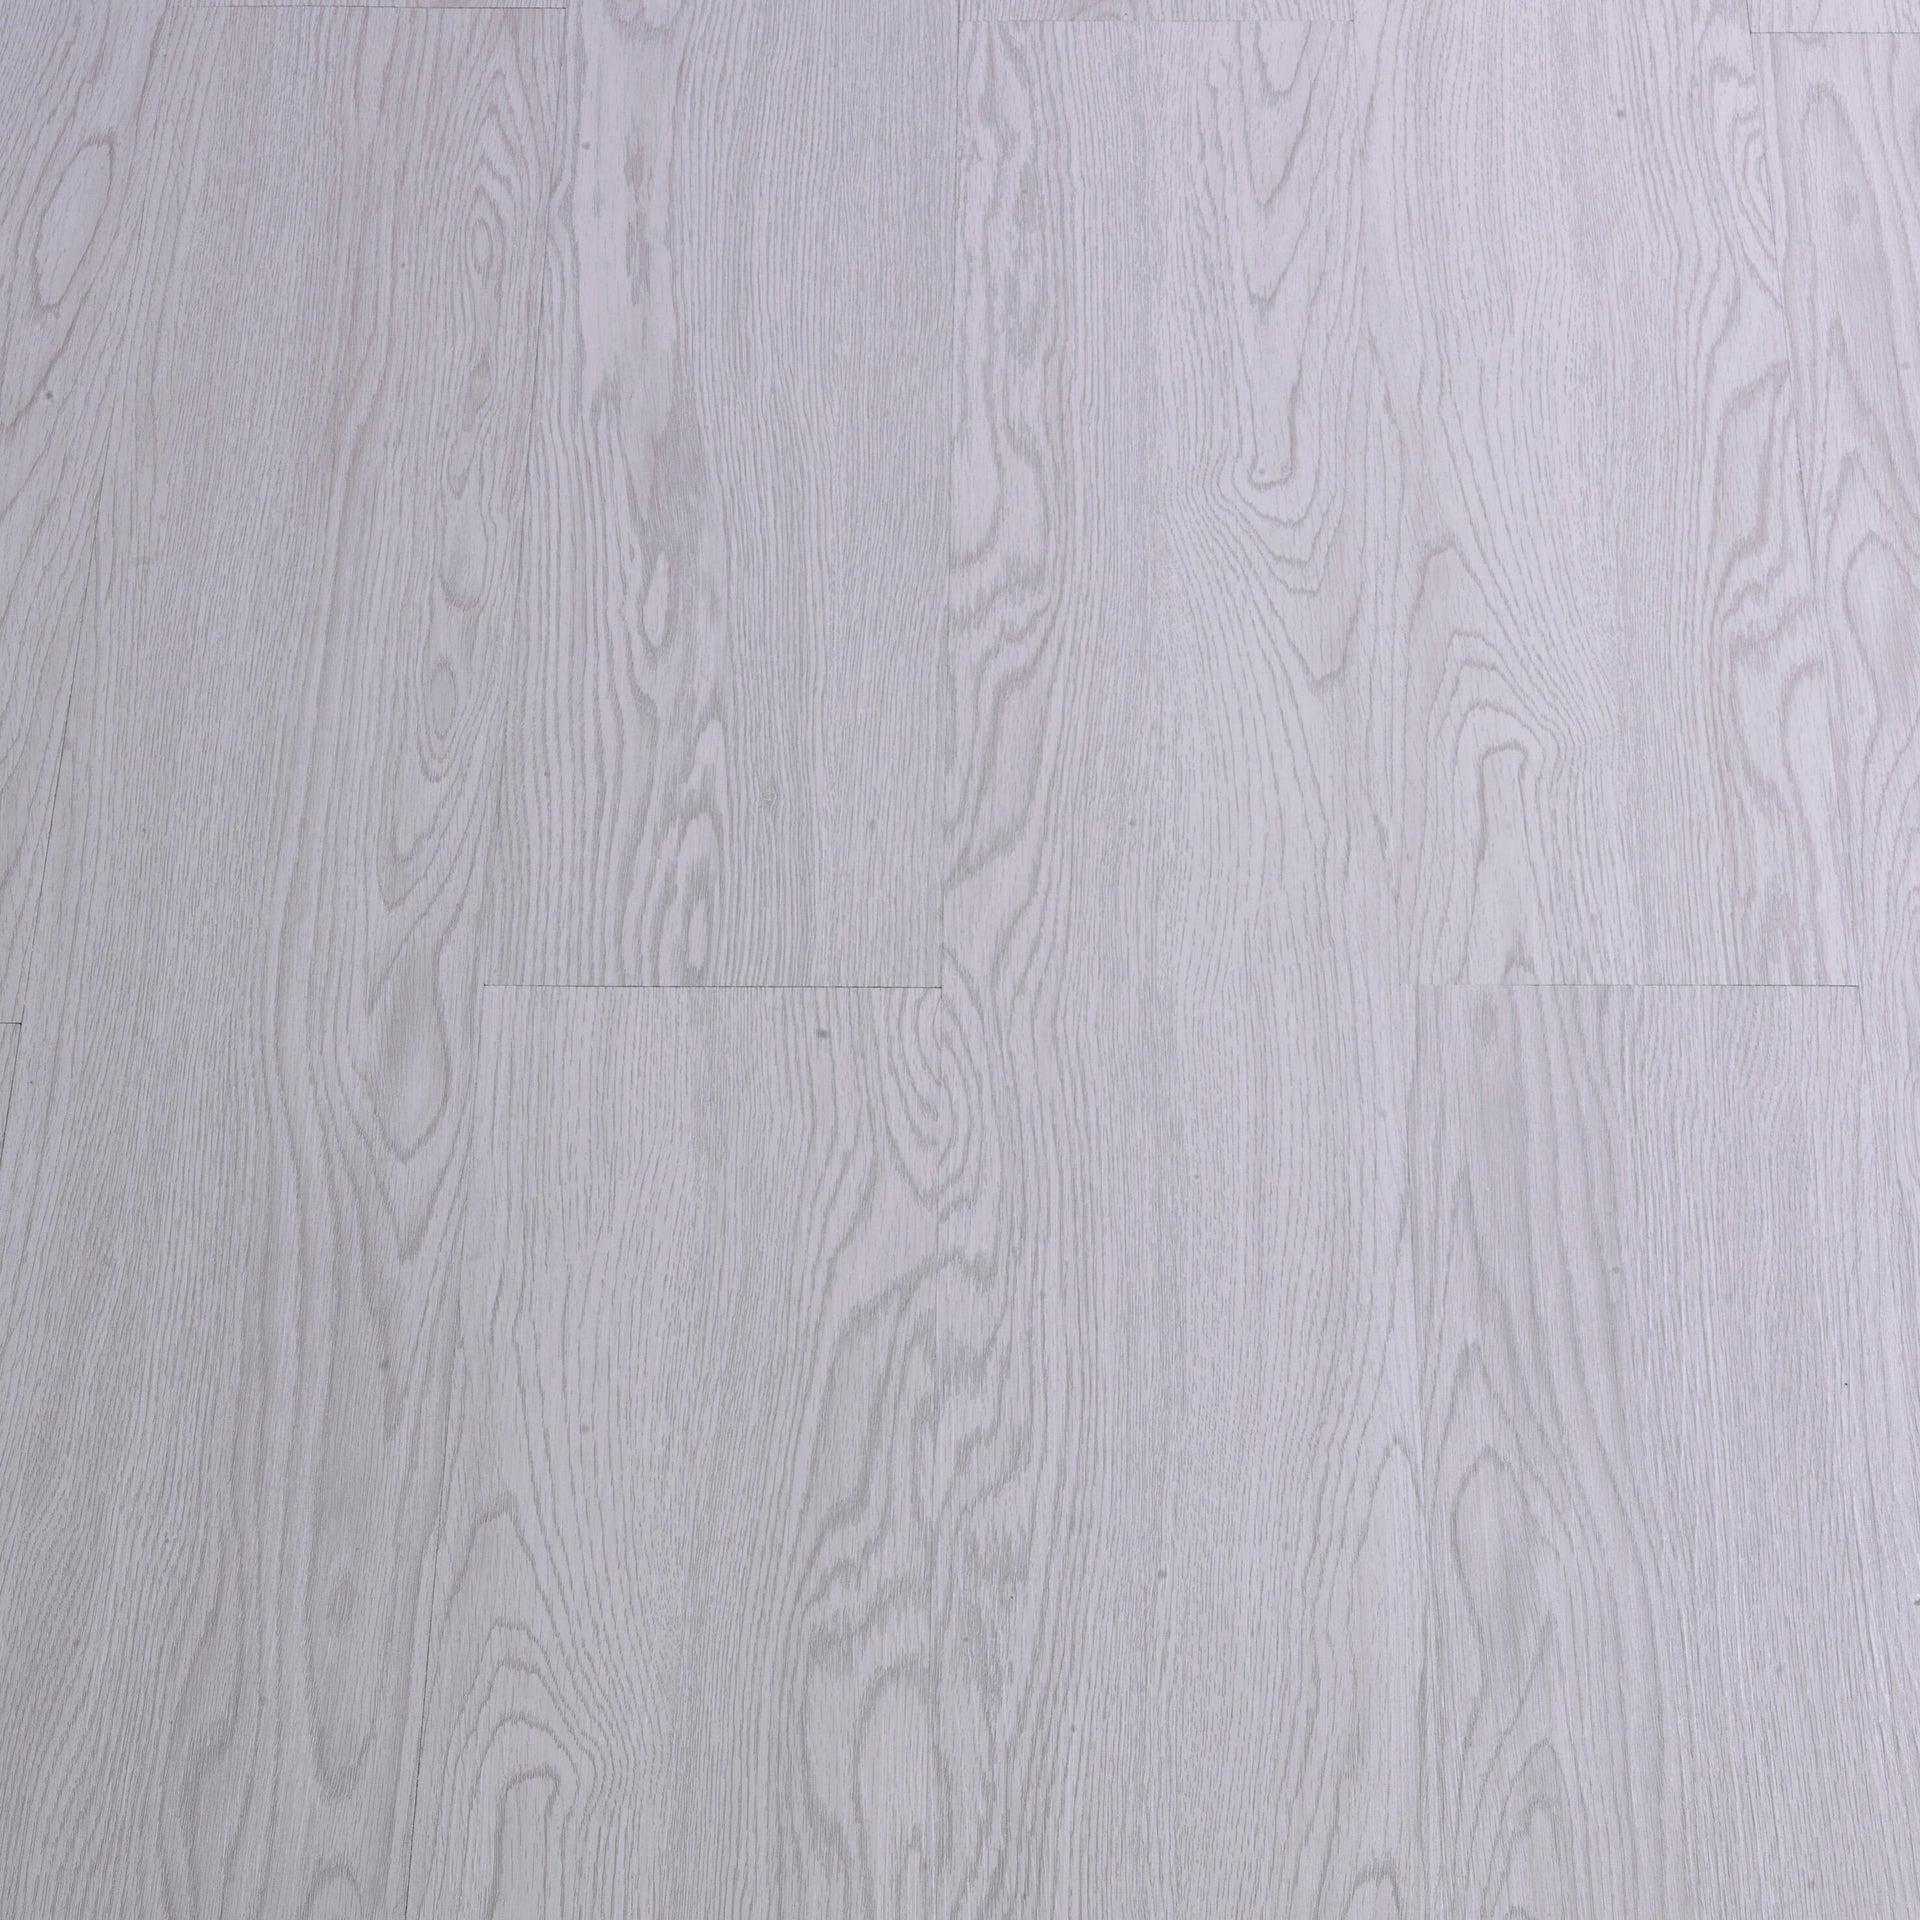 Pavimento PVC adesivo Whiwood Sp 1.8 mm bianco - 6